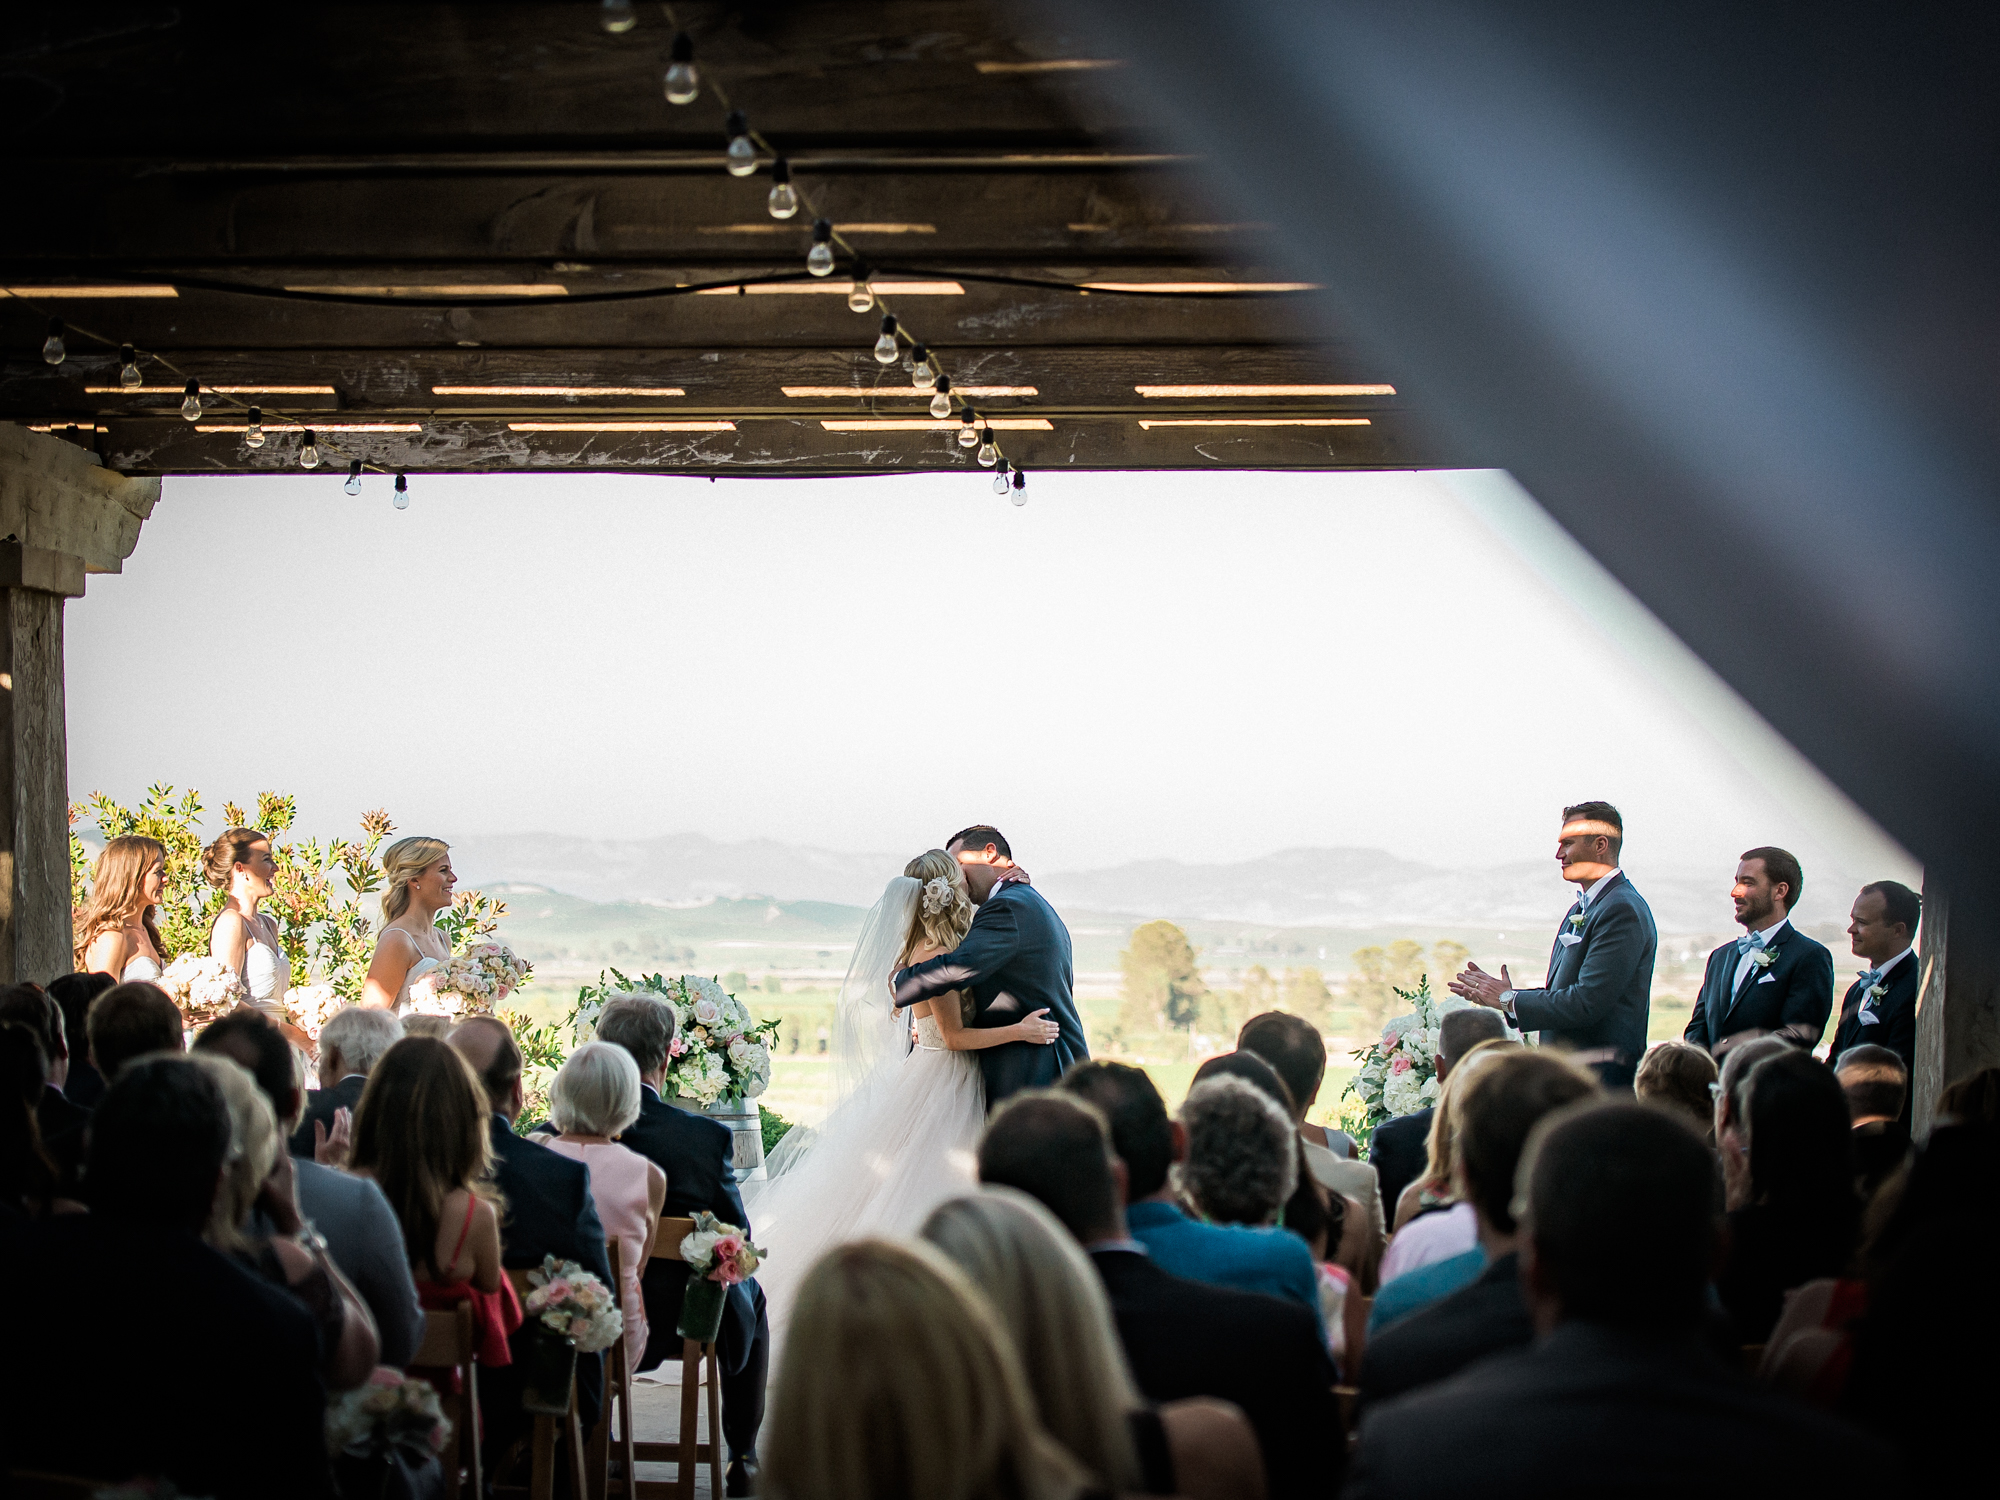 Aimee+Logan_wedding_spp-97.jpg